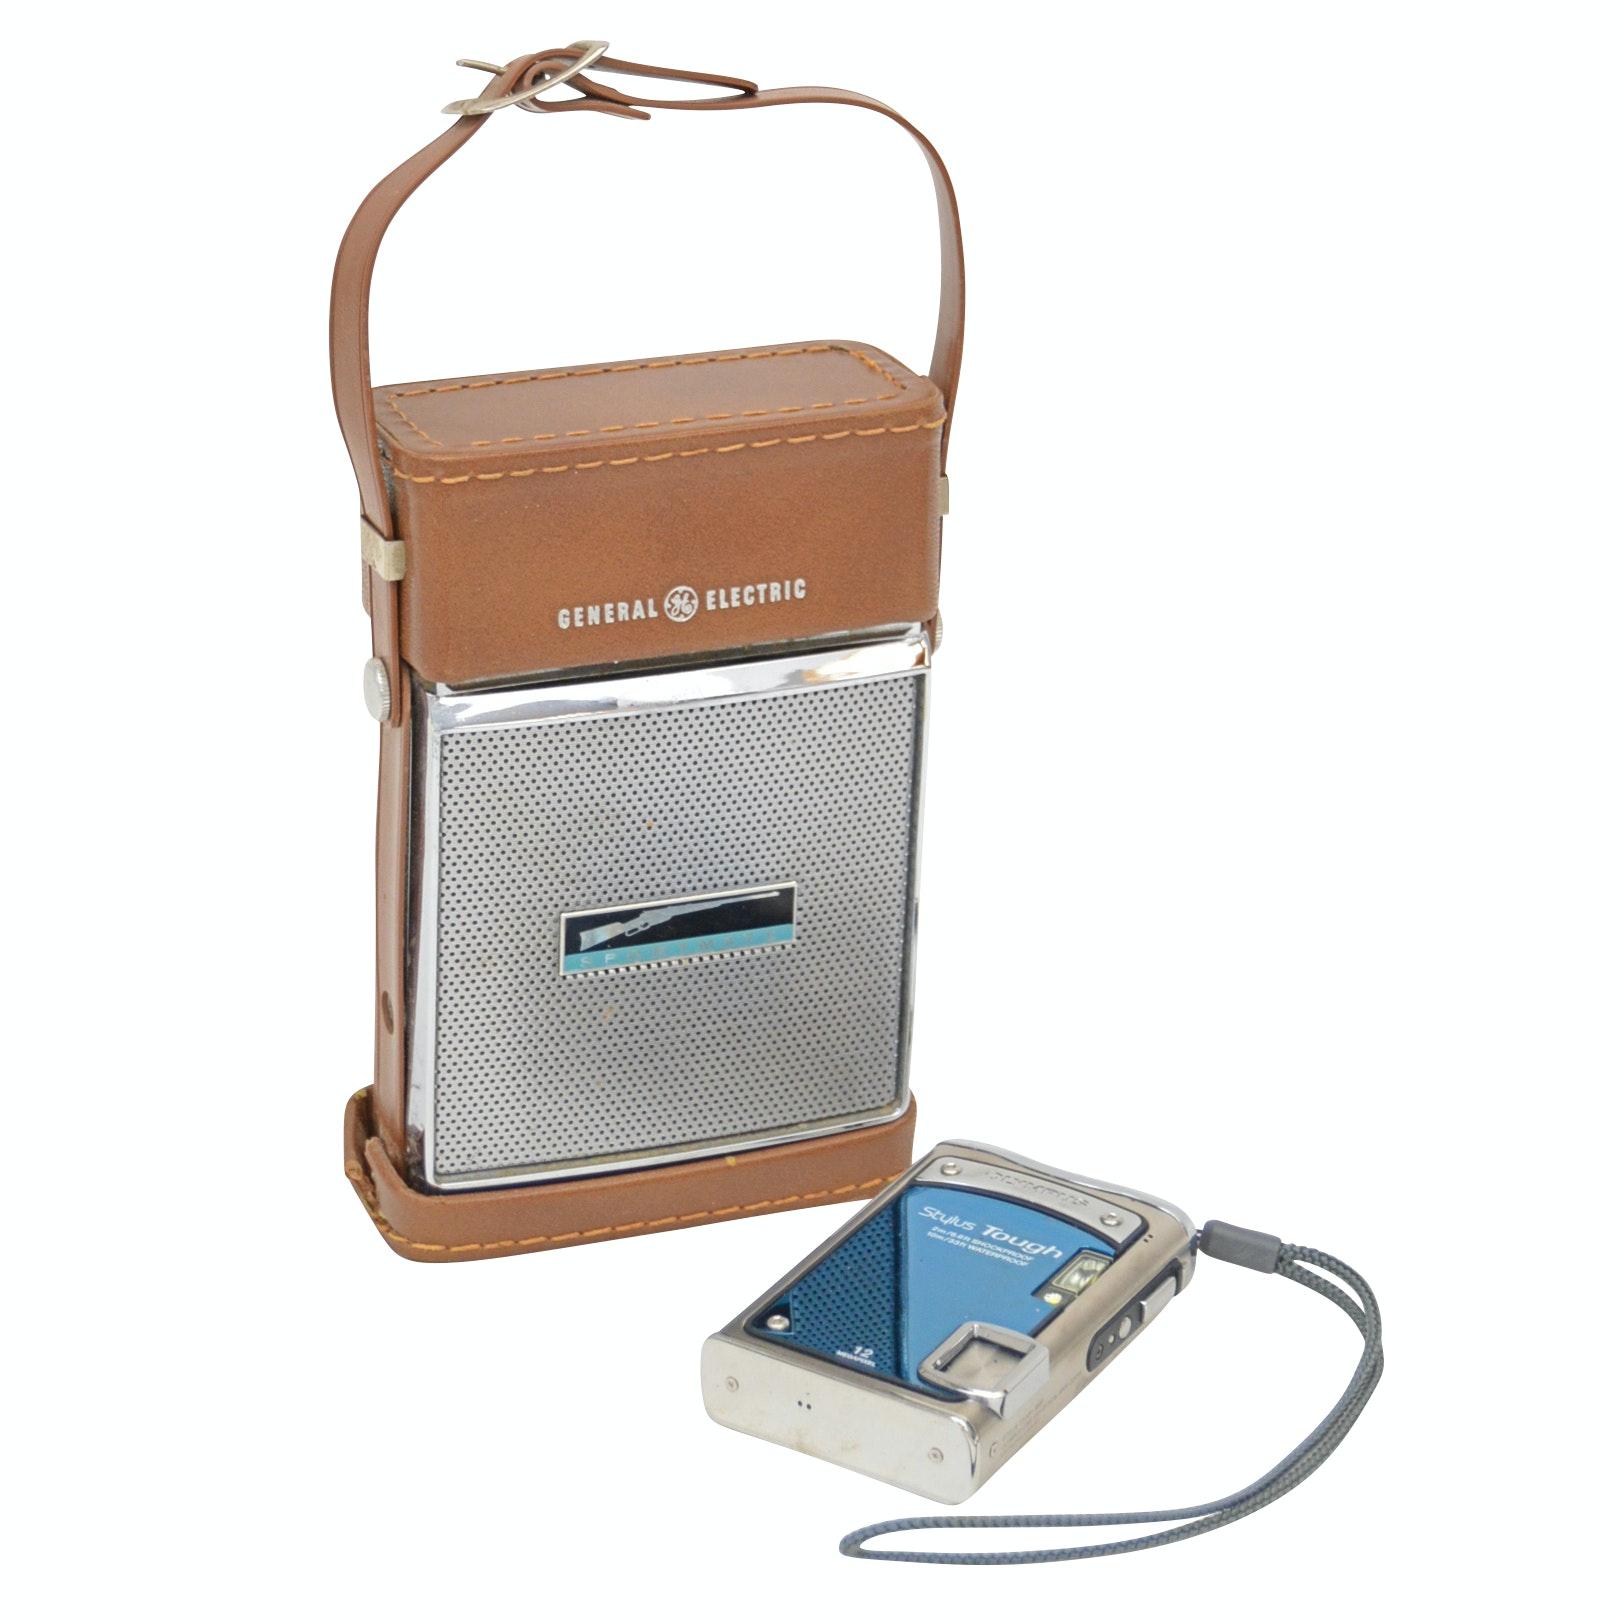 Vintage GE Sportmate Portable Radio+Olympus Stylus Tough 12 MP Digital Camera